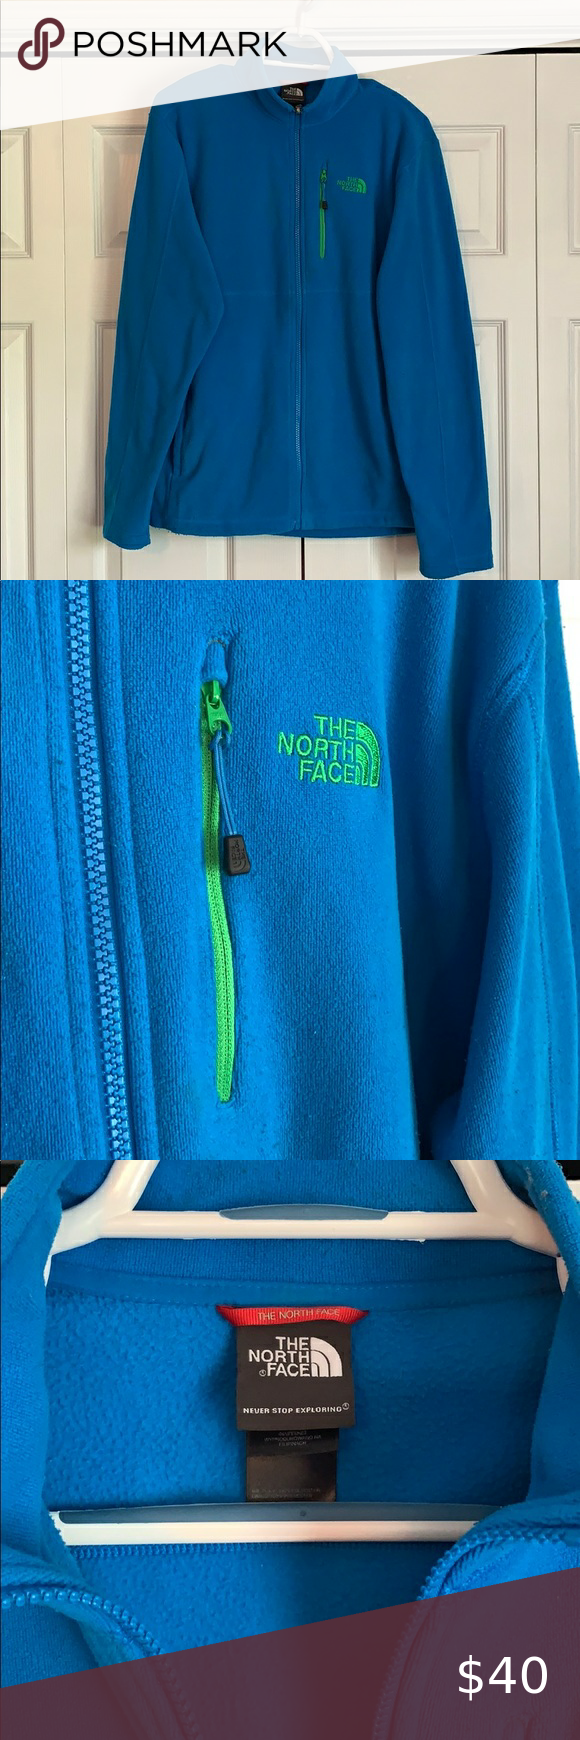 Host Pick 4x The North Face Men S Jacket North Face Mens North Face Jacket Mens Hoodies Men Pullover [ 1740 x 580 Pixel ]